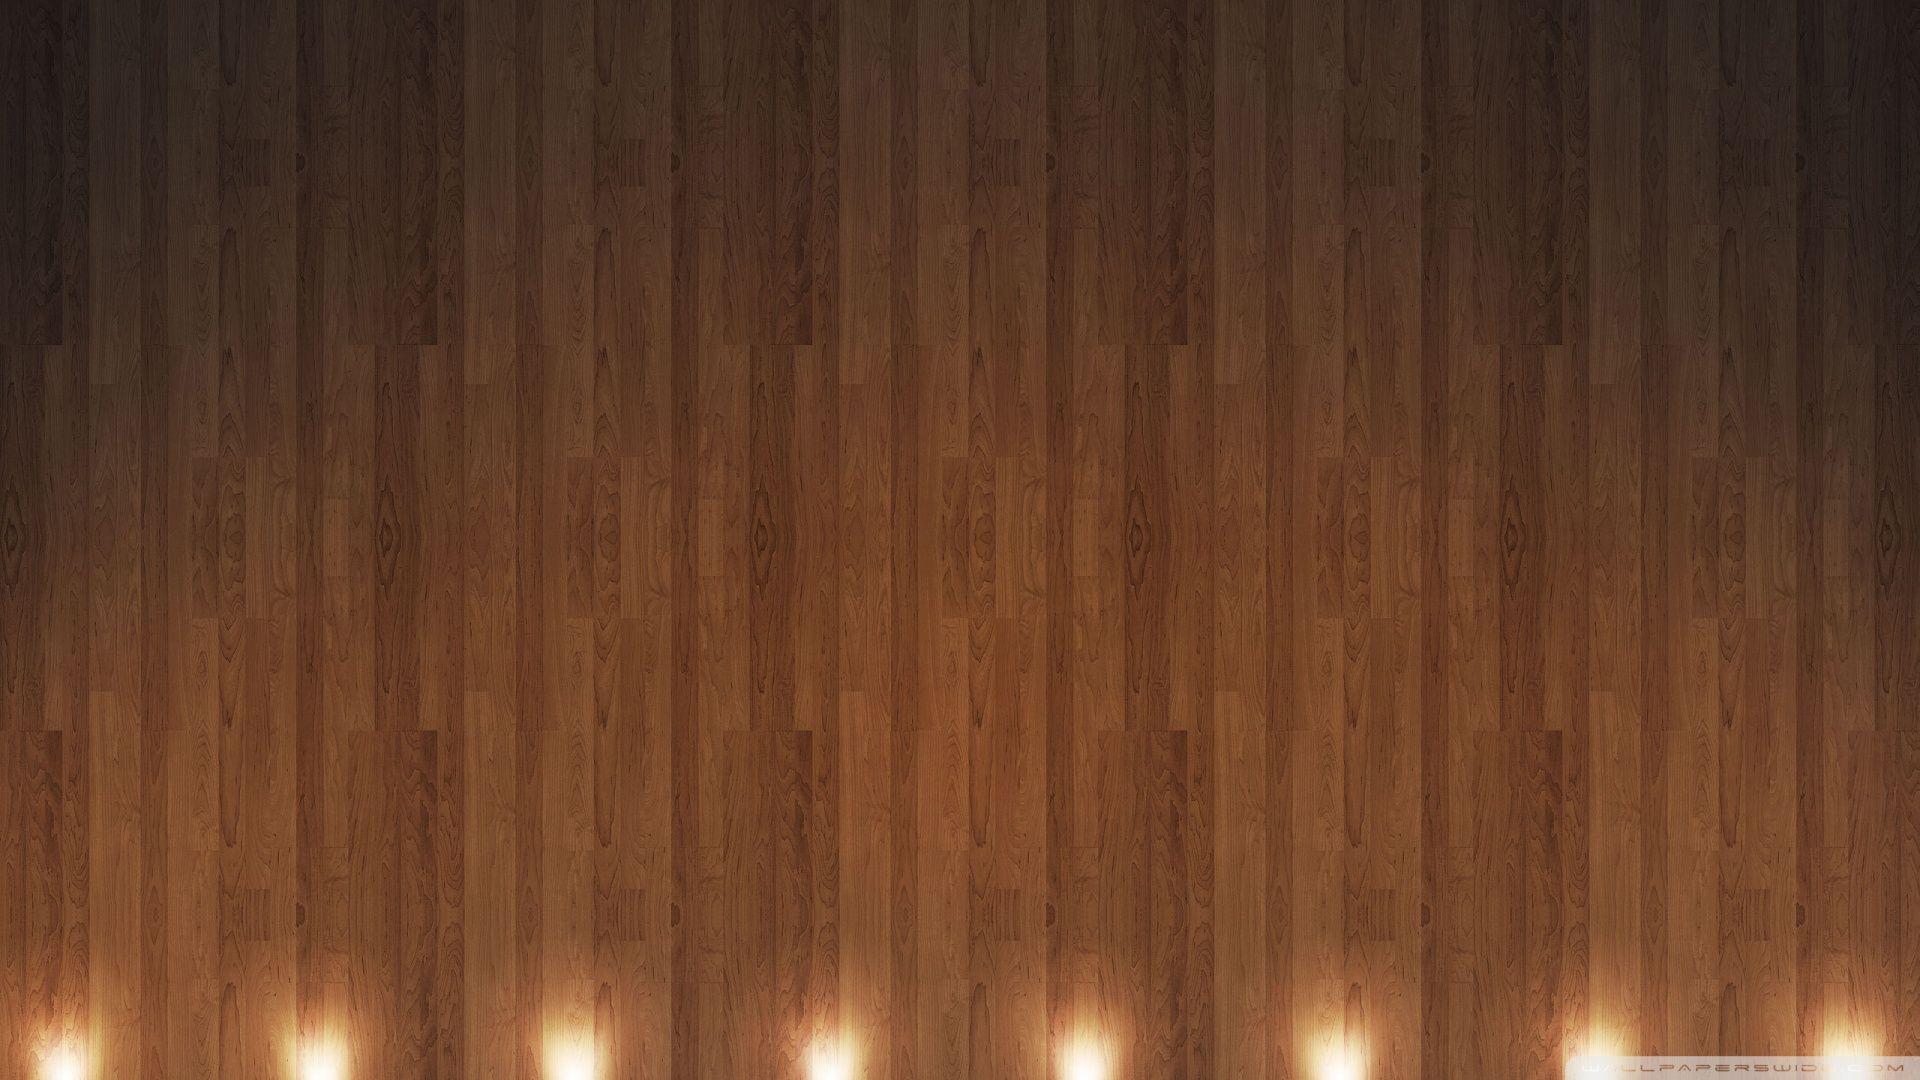 Full Hd 1080p Wood Wallpapers Hd Desktop Backgrounds 1920x1080 Wood Grain Wallpaper Desk Wallpaper Wooden Wallpaper